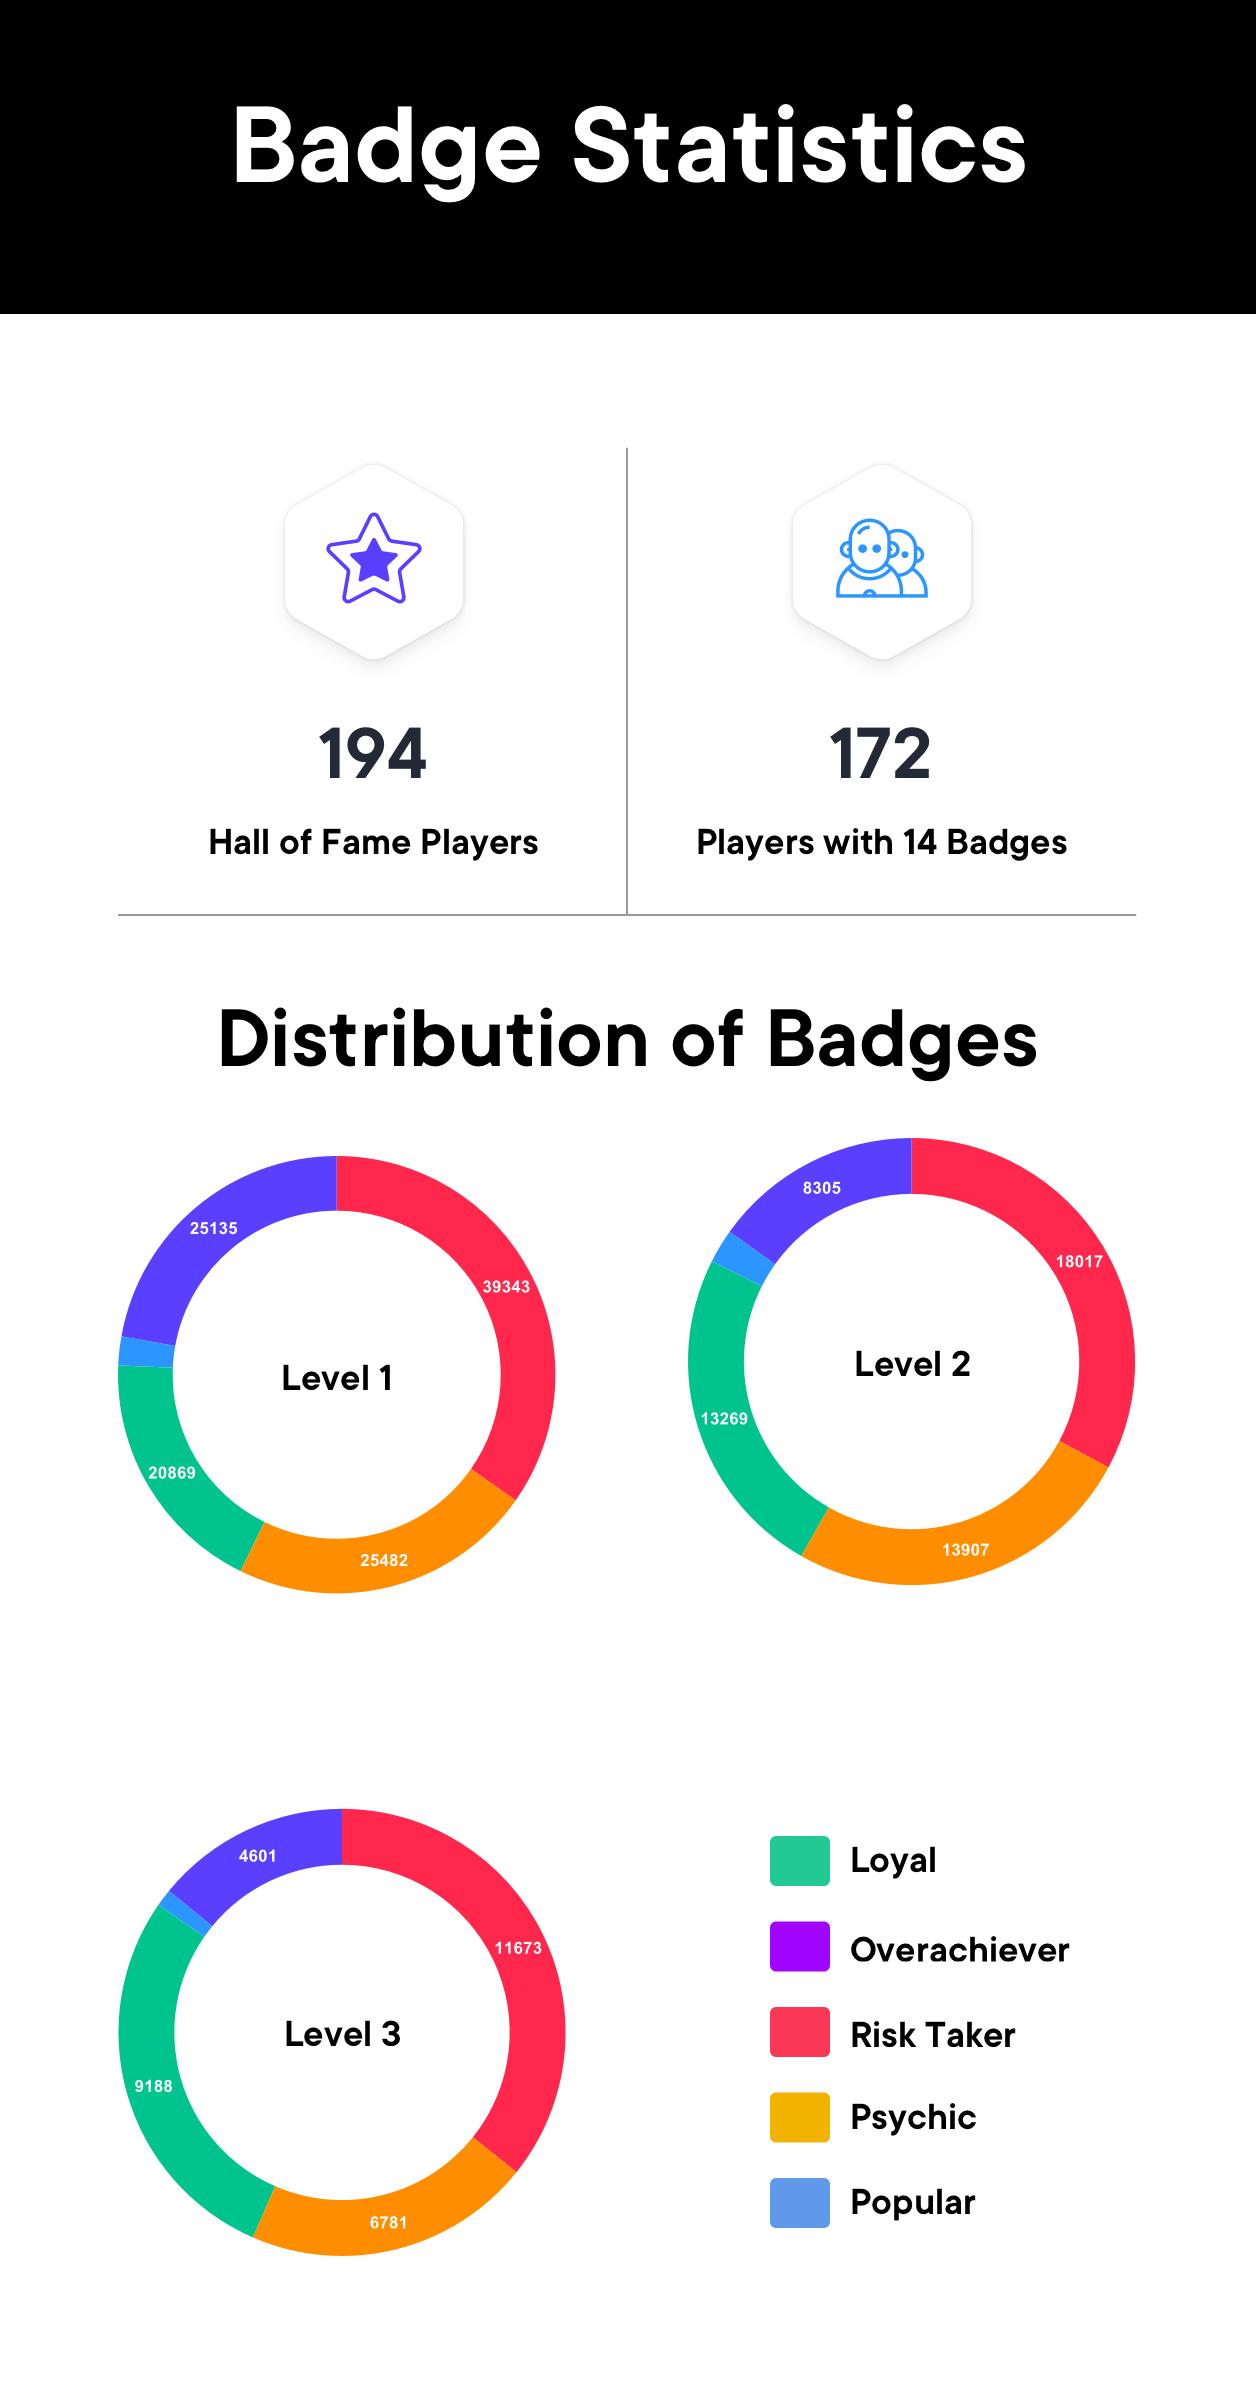 badge statistics swissborg community app